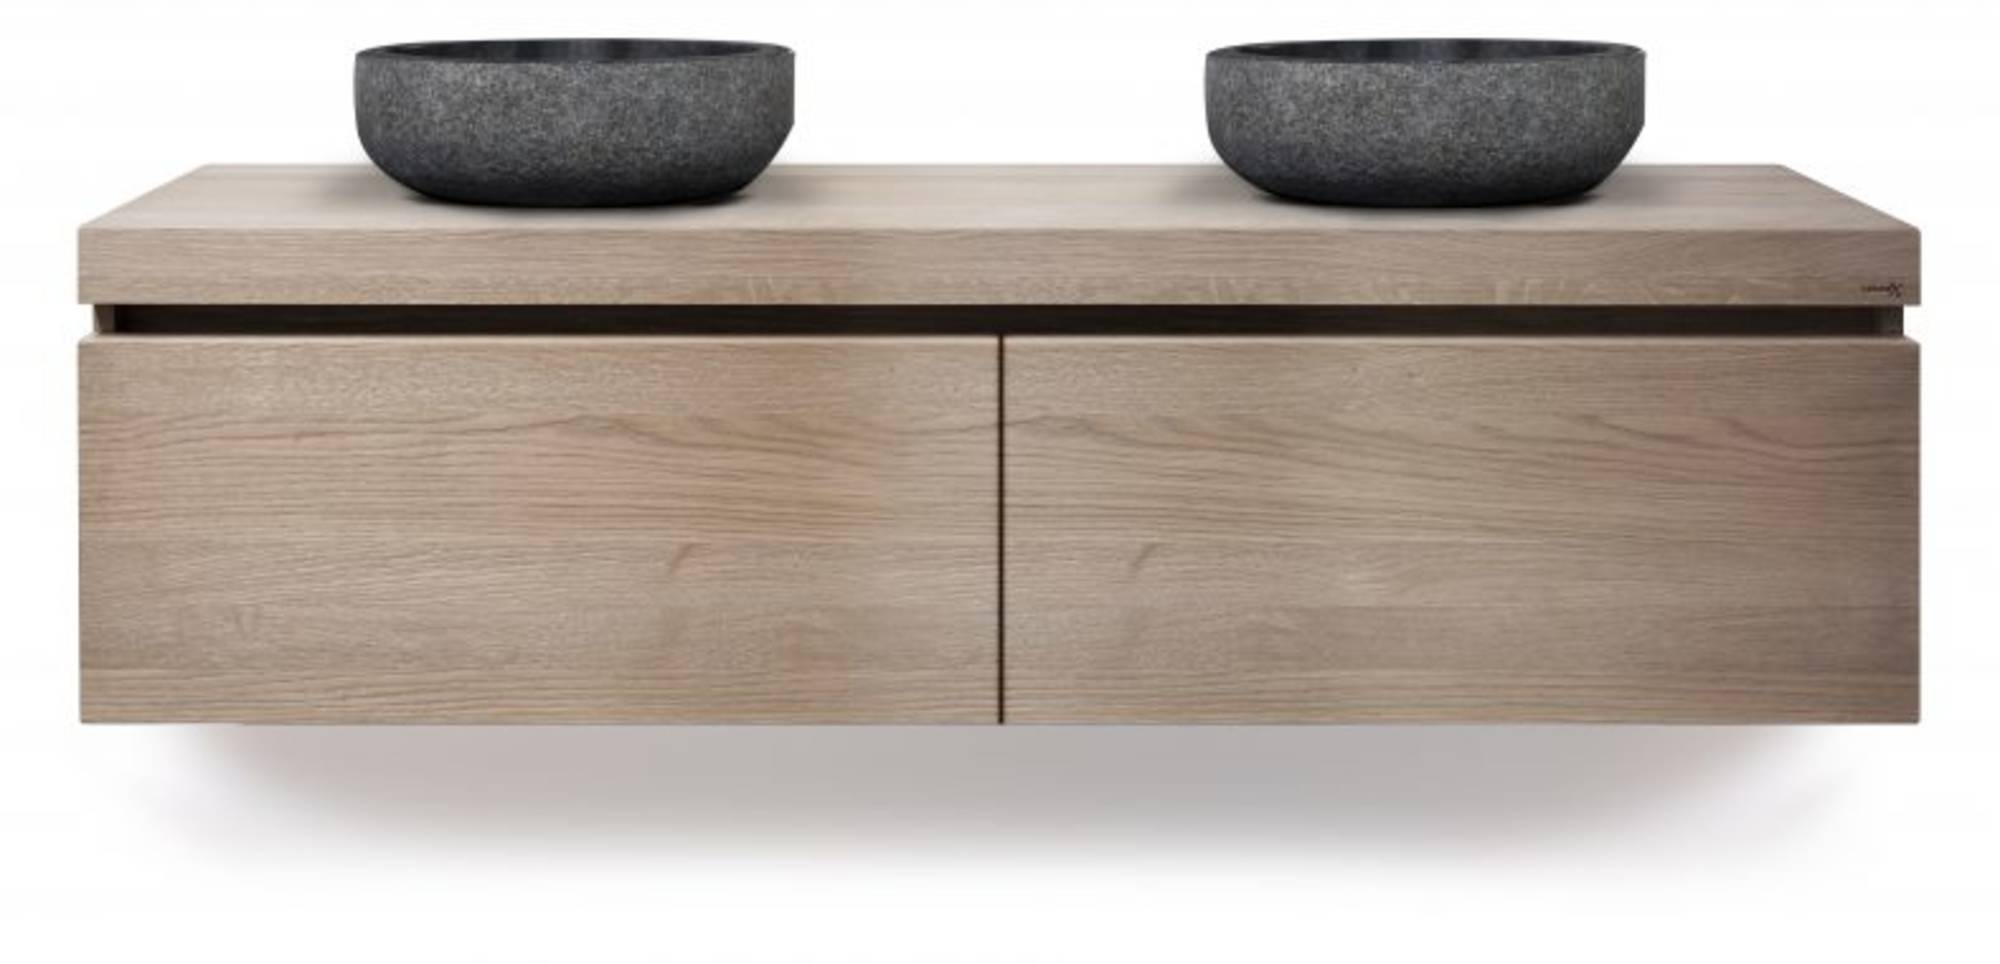 Looox Wood Wooden Drawer Box 140x46x45 cm Old Grey